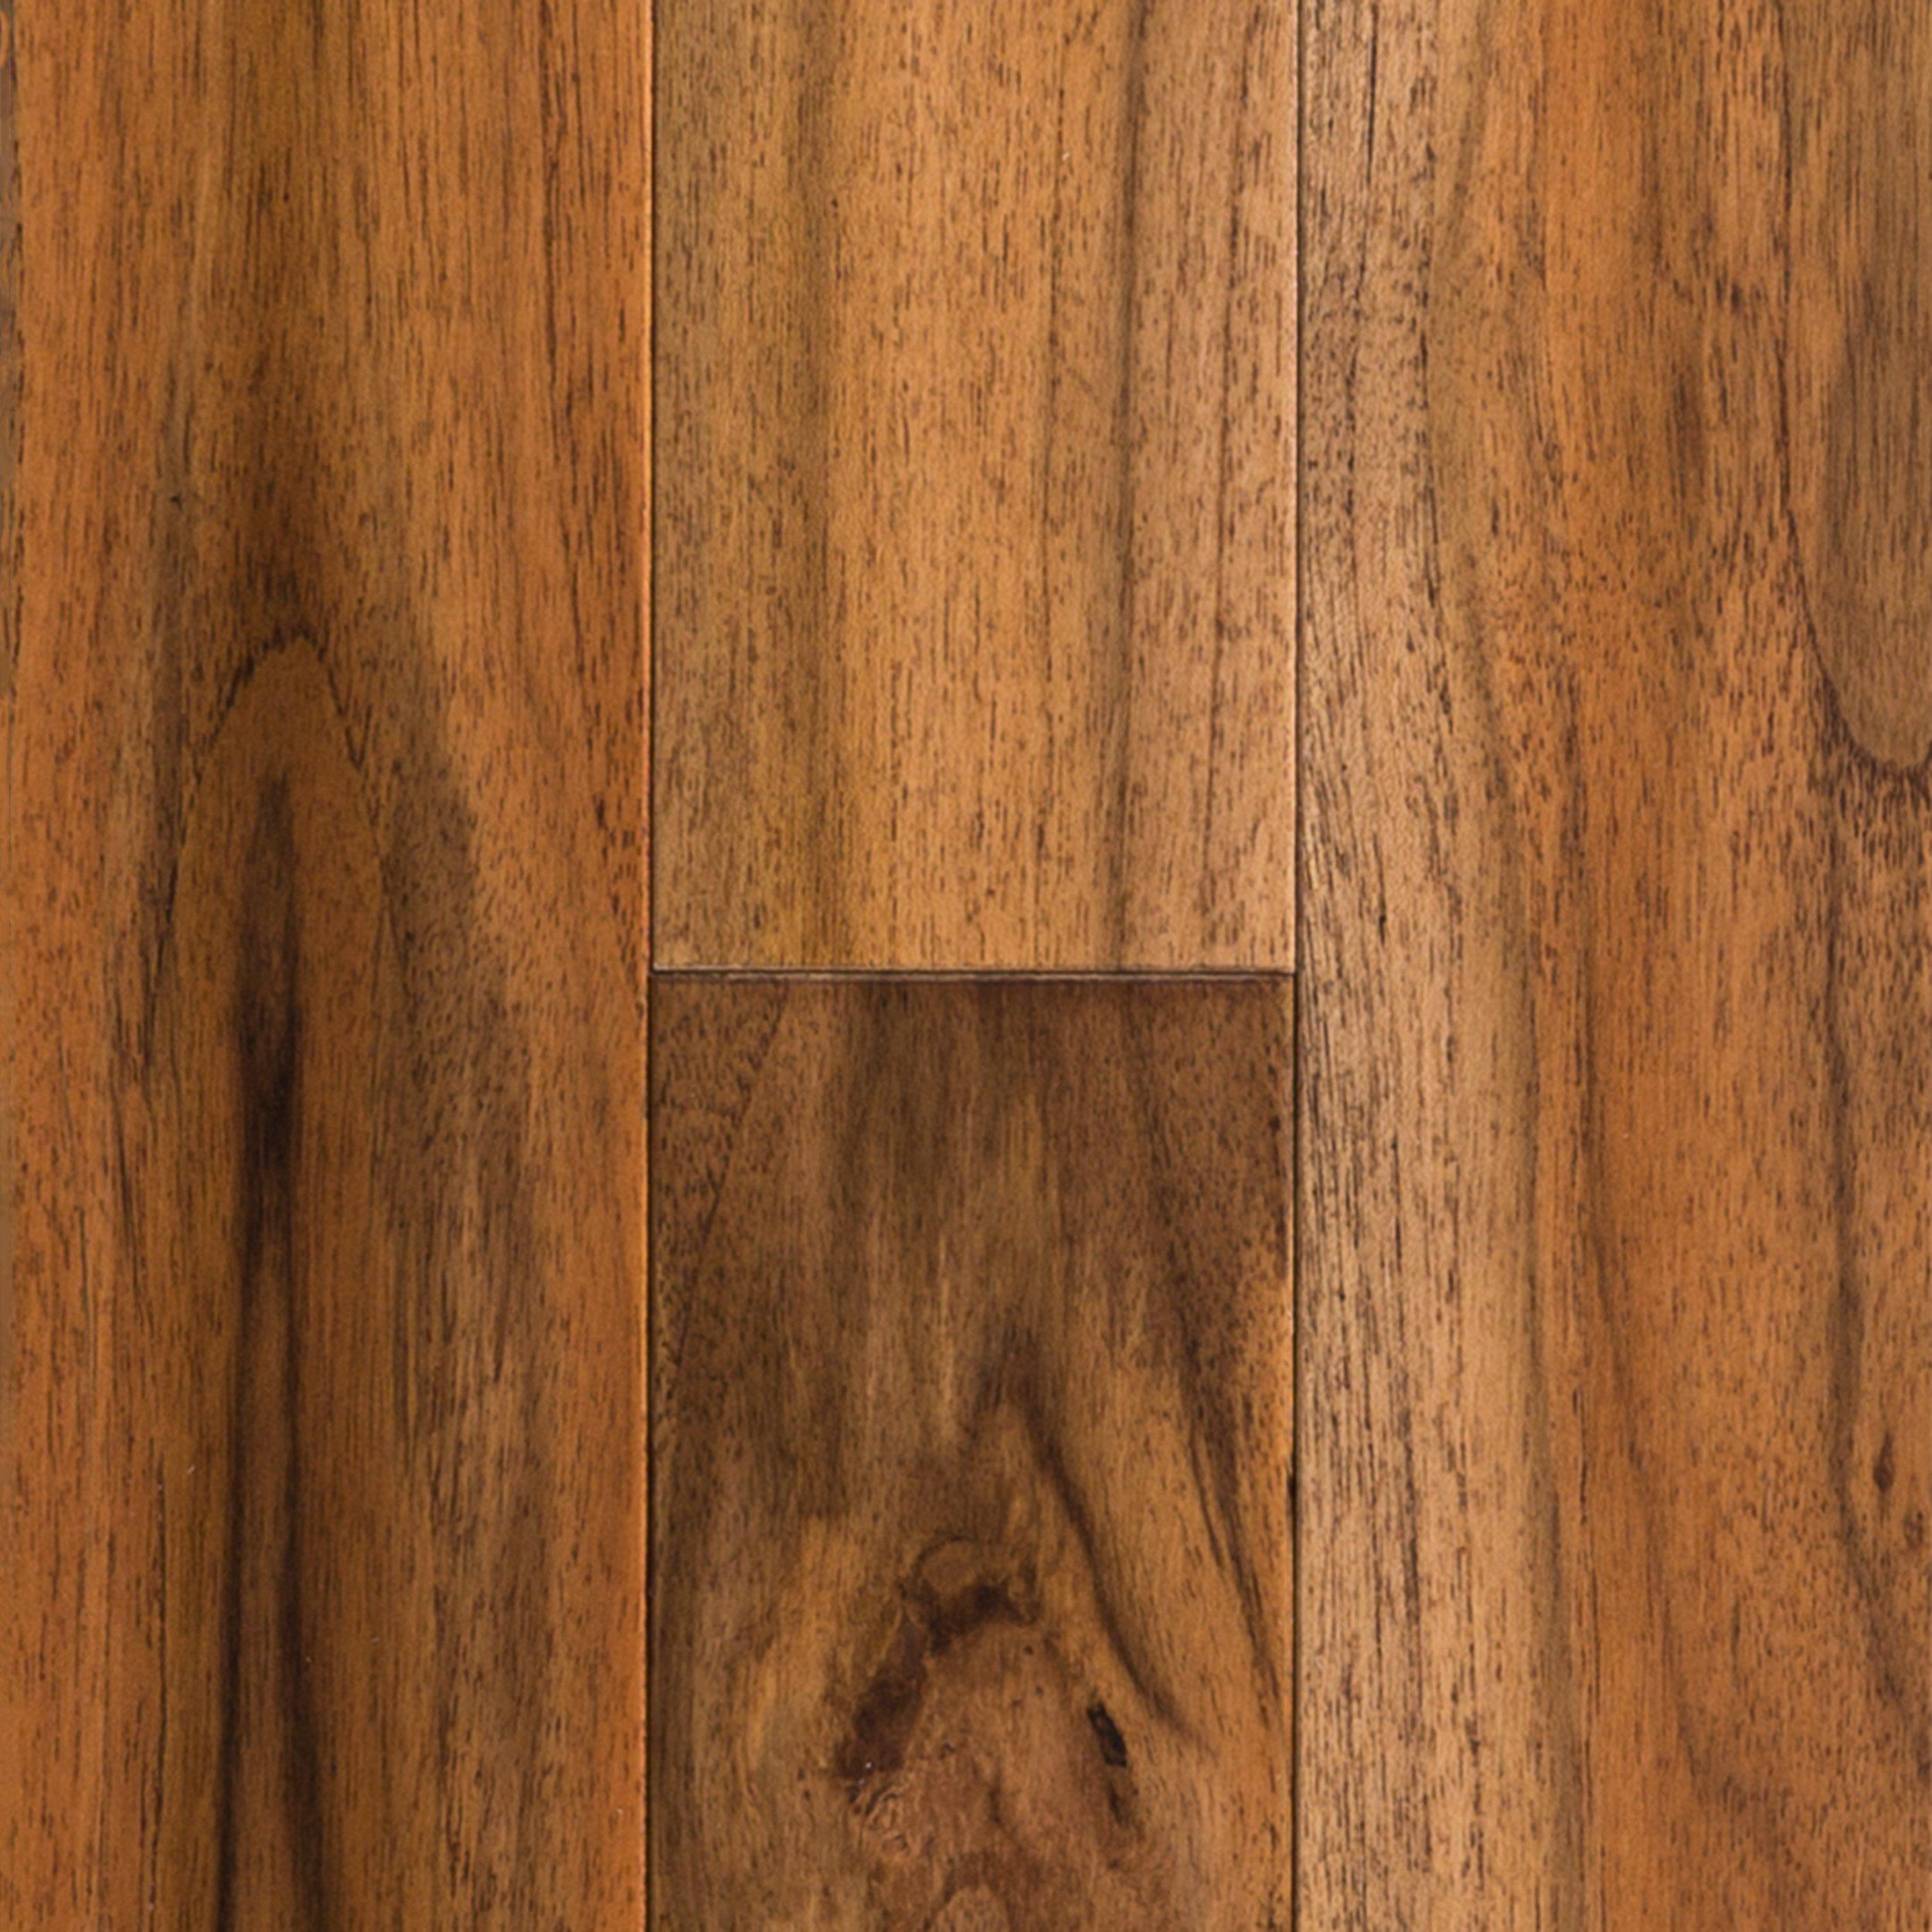 Brazilian Plantation Teak Solid Hardwood   3/4in. X 3in.   100120518 | Floor  And Decor